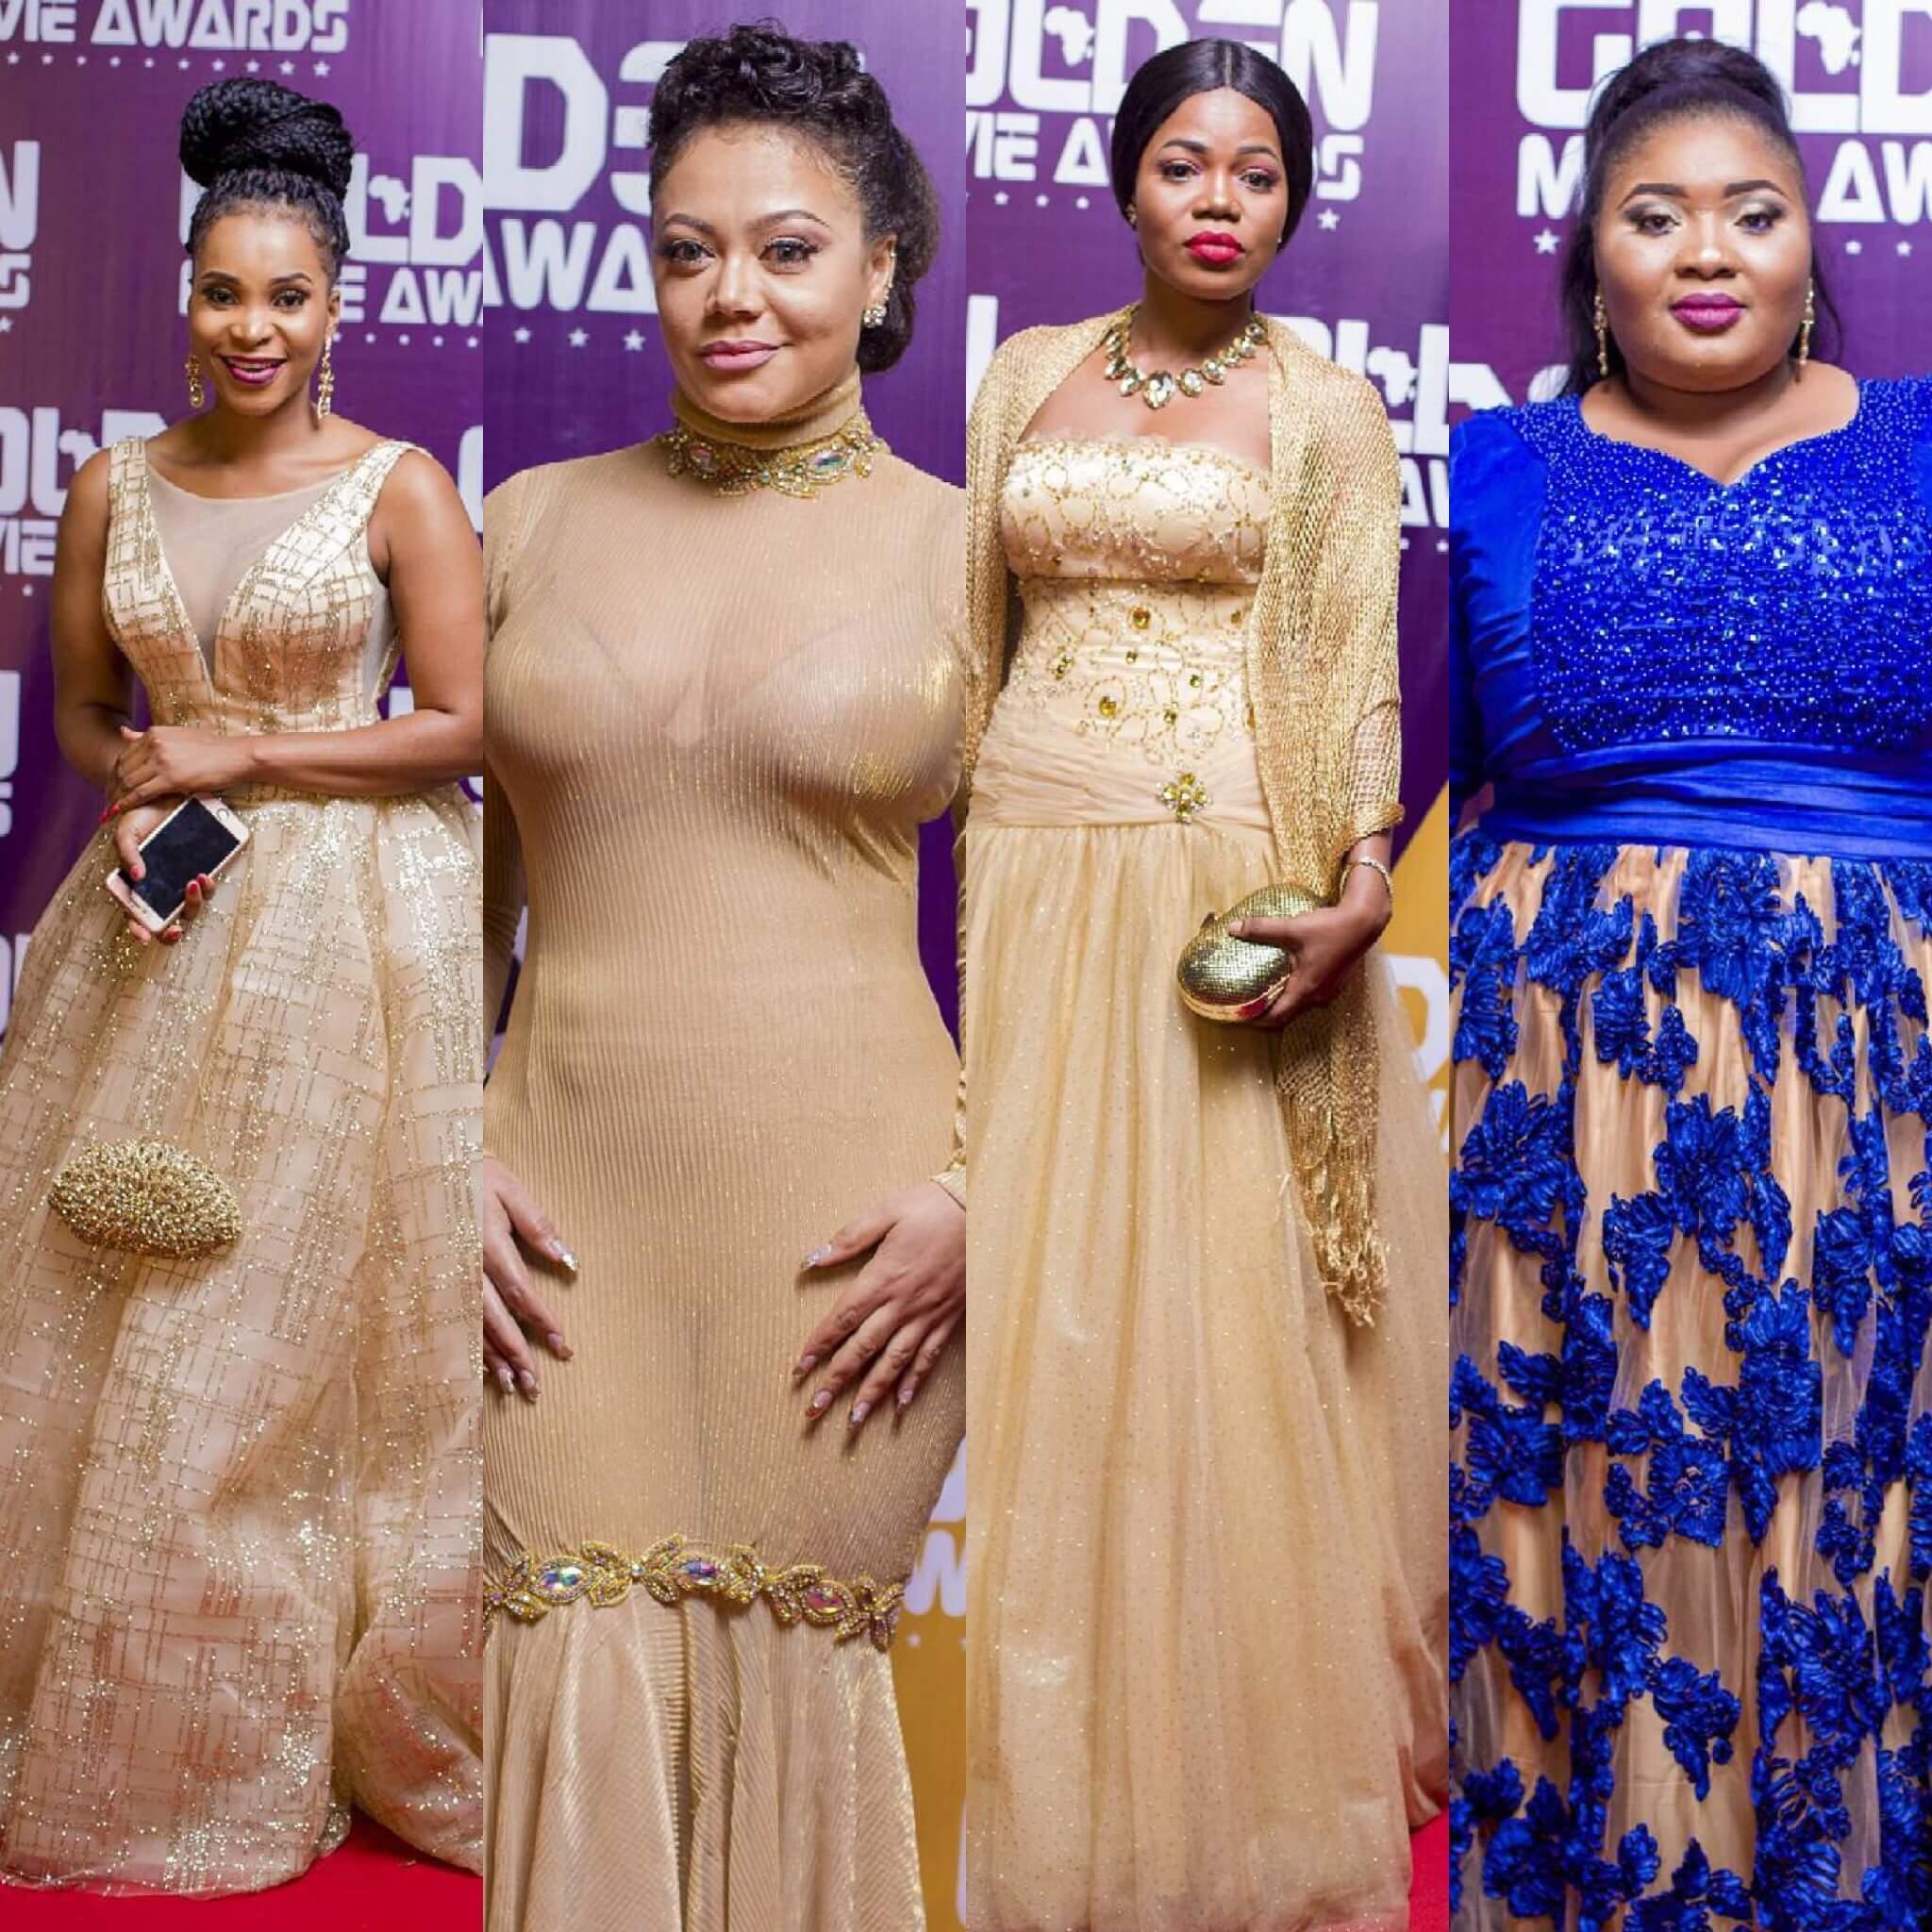 Yvonne Nelson Blasts Organizer of Golden Movie Awards